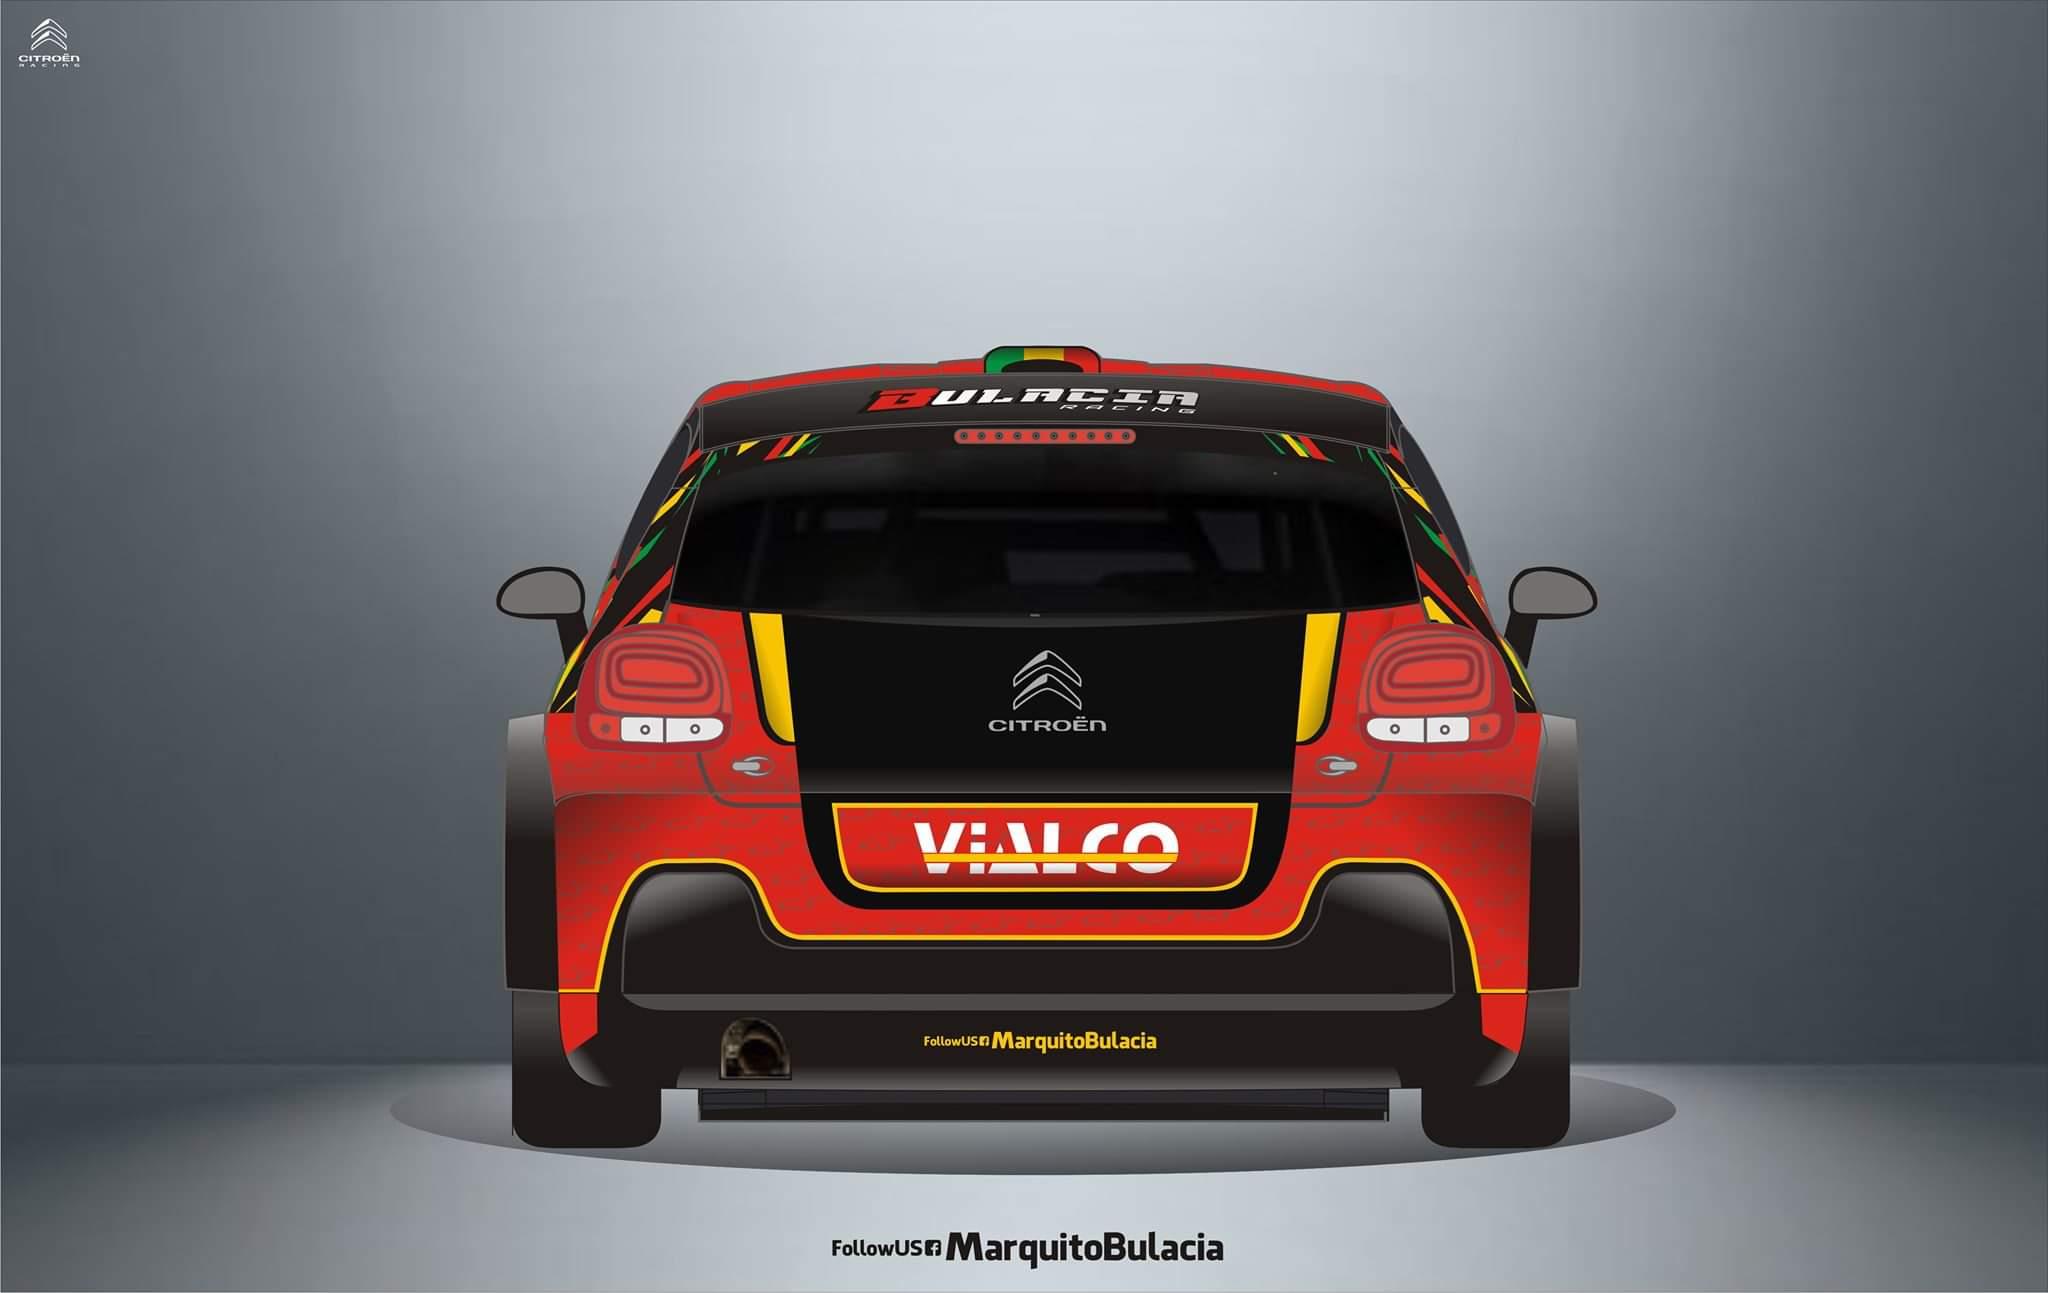 World Rally Championship: Temporada 2020 - Página 6 EOVhPCdWkAA33pv?format=jpg&name=4096x4096